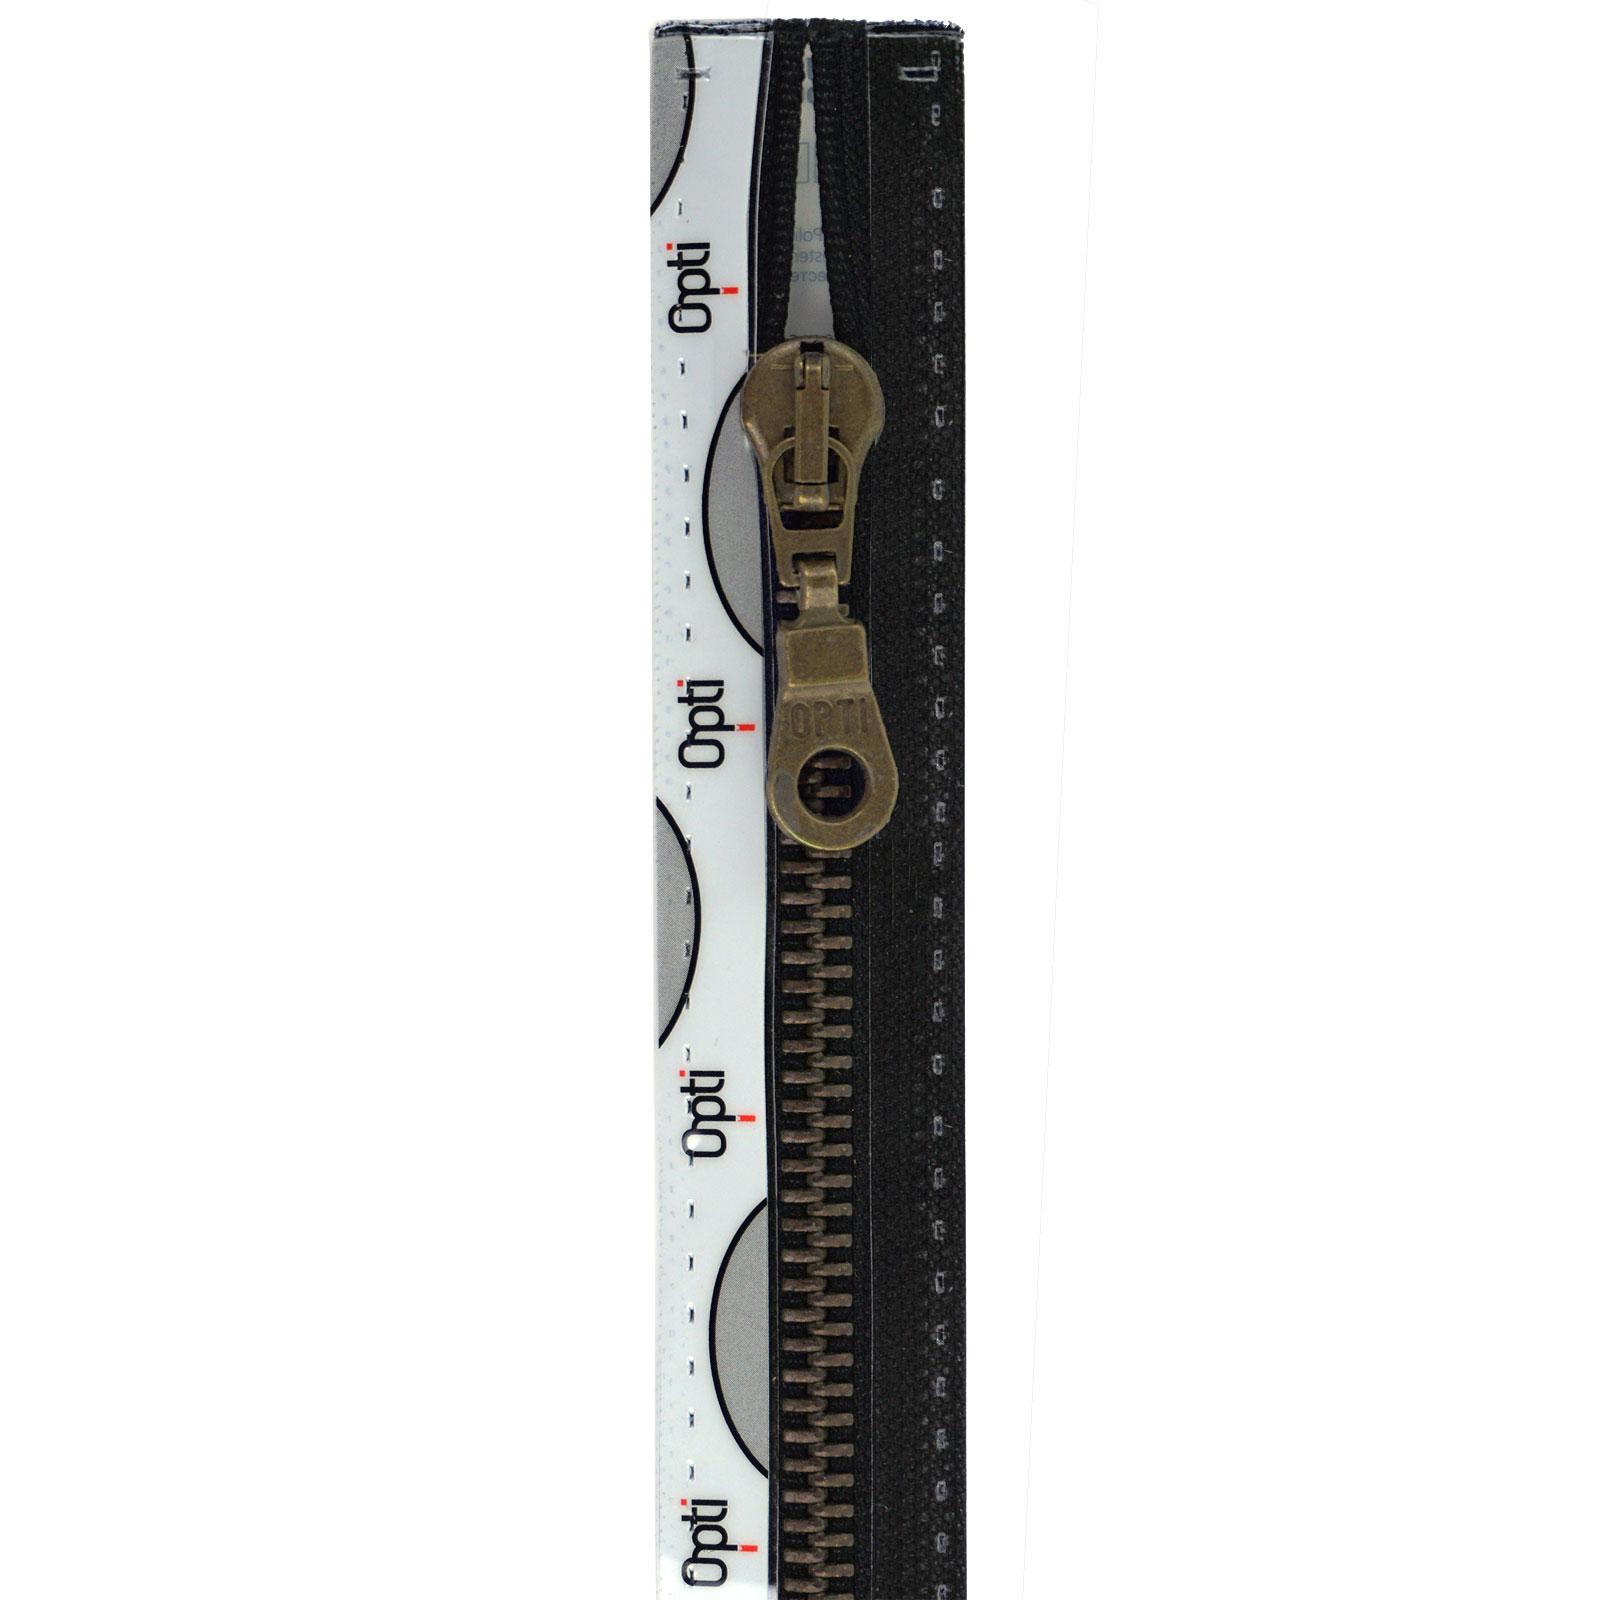 Rits;Opti-Lon M60 Zwart-000